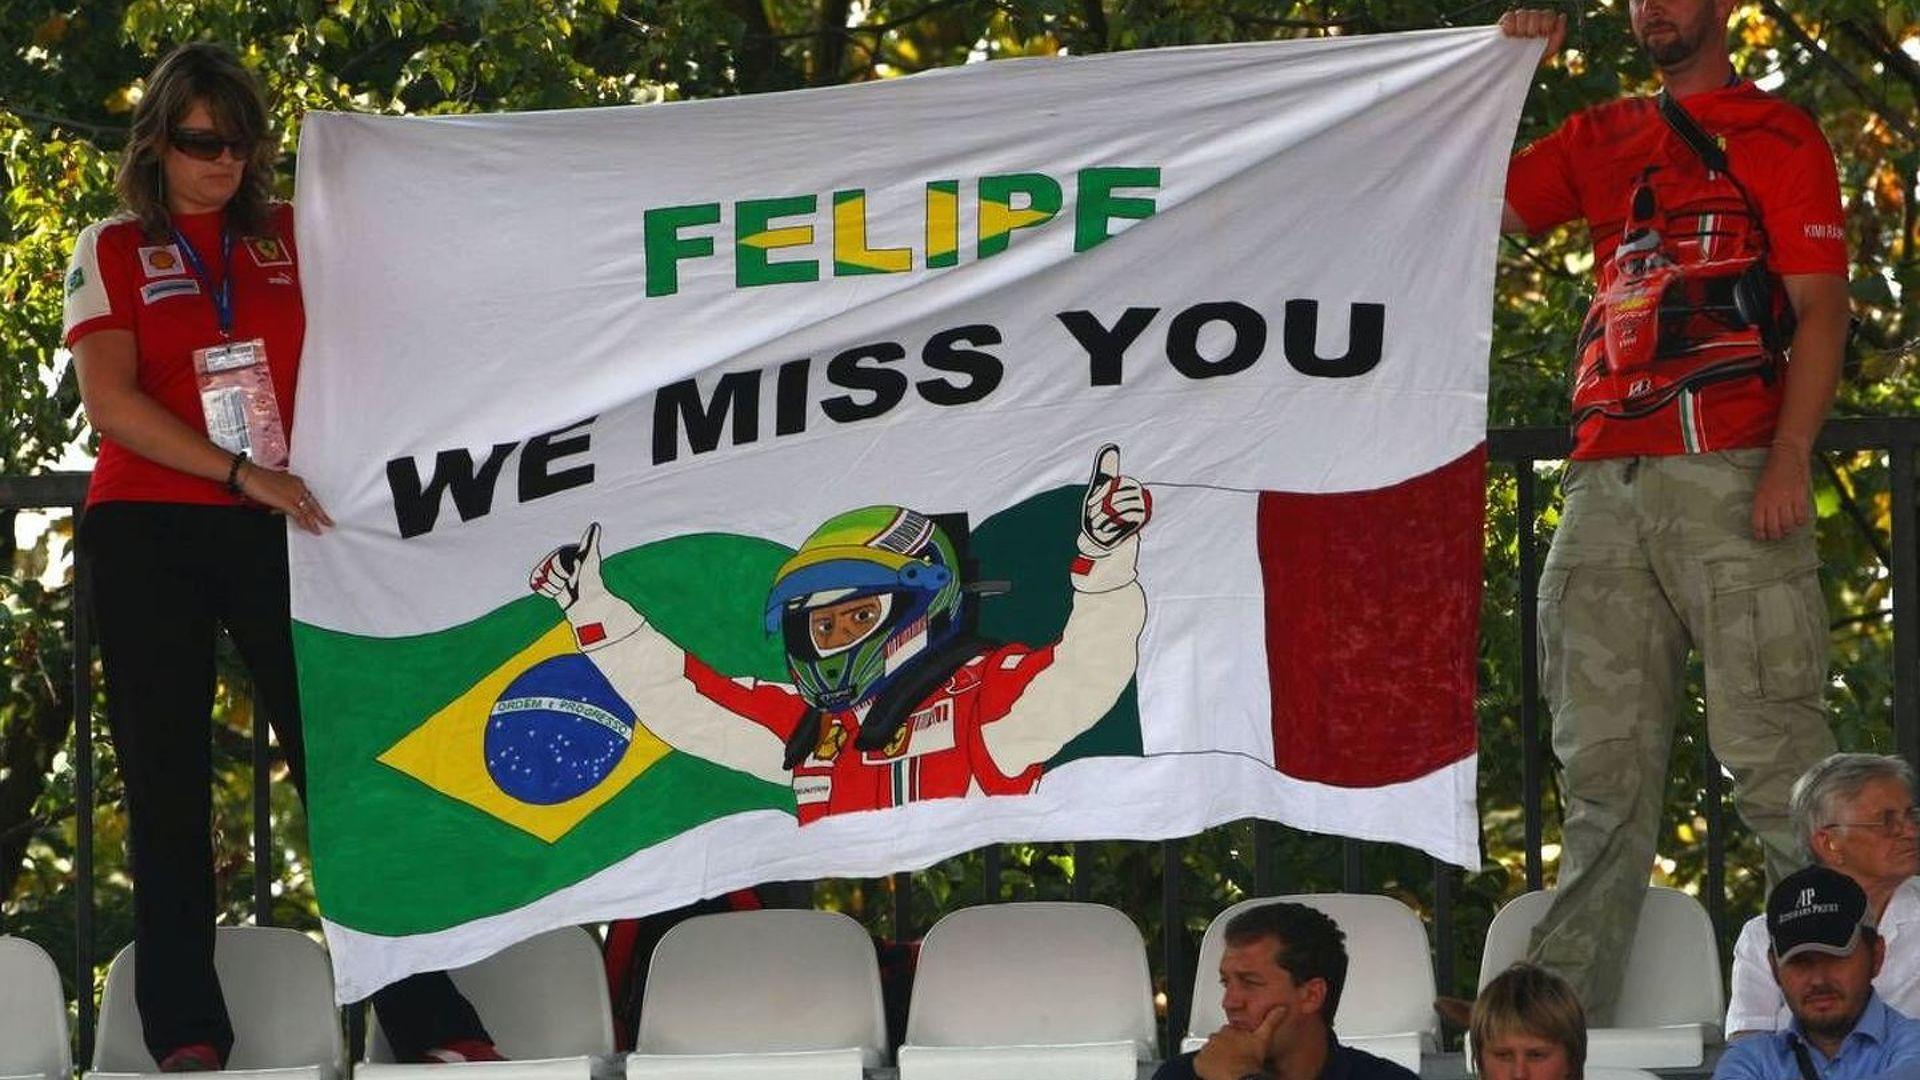 FIA tests show Massa's eyesight '100pc'